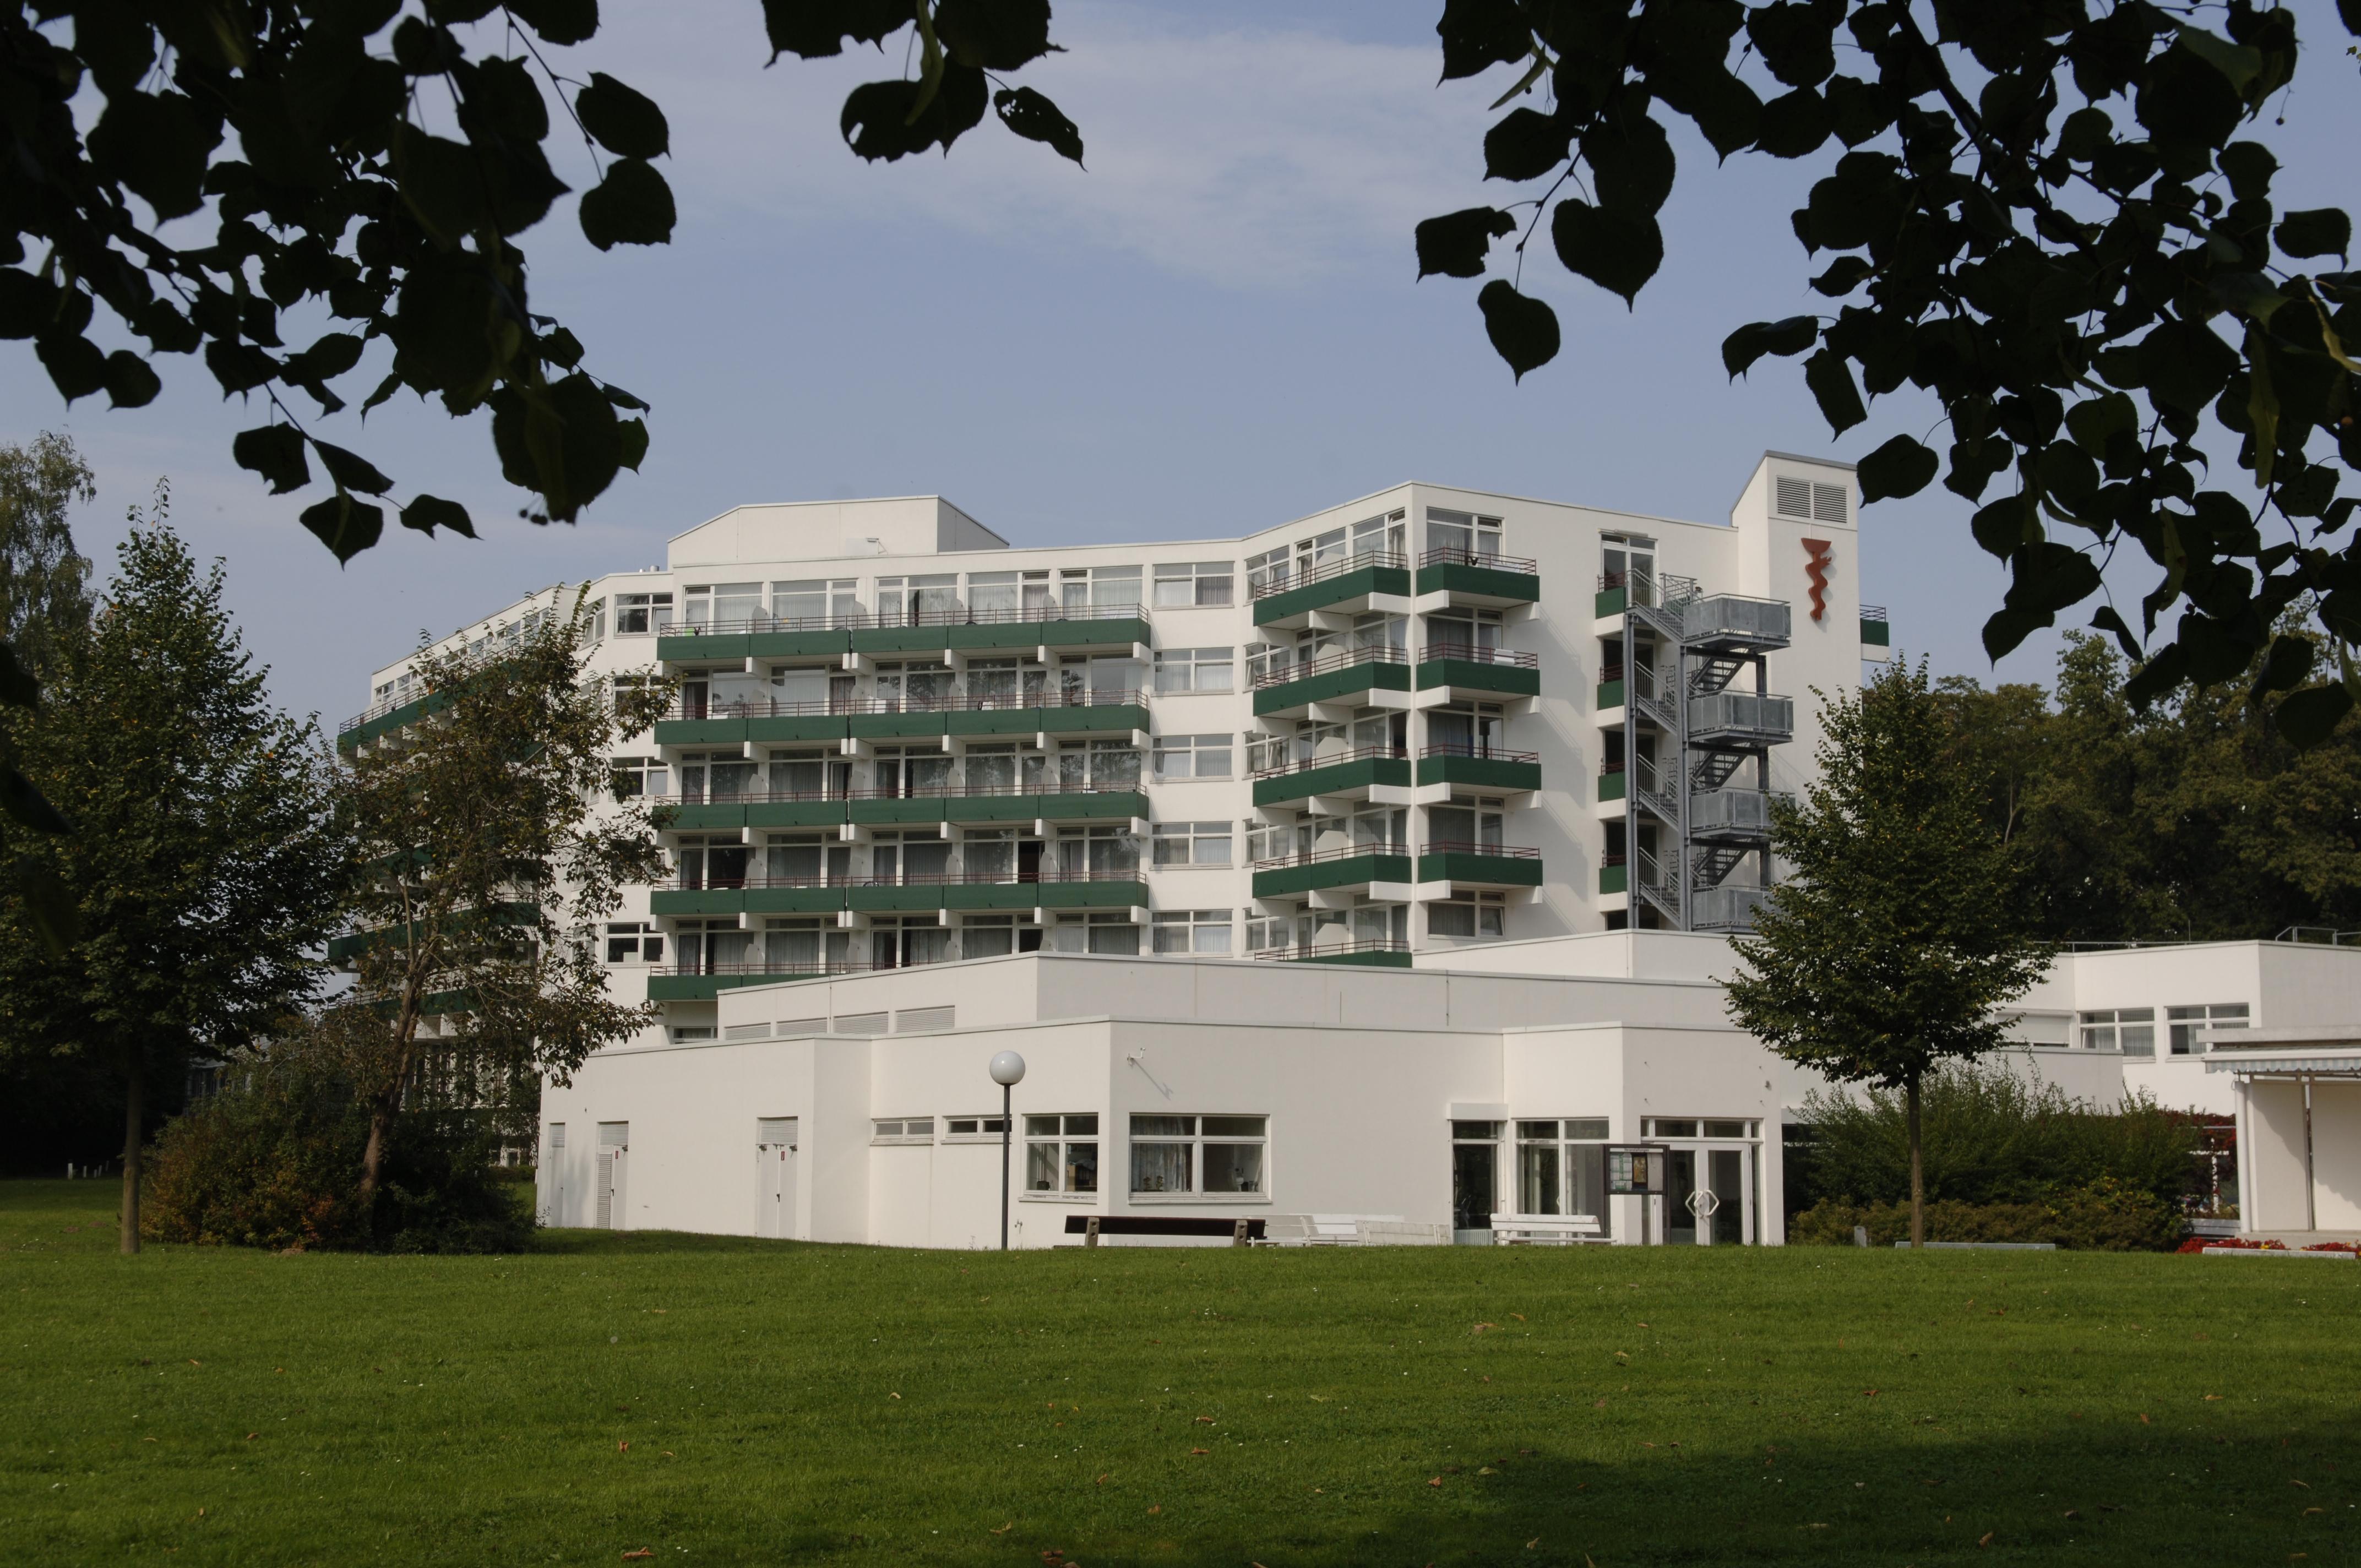 Paracelsus Klinik Bad Gandersheim Hotel Garni